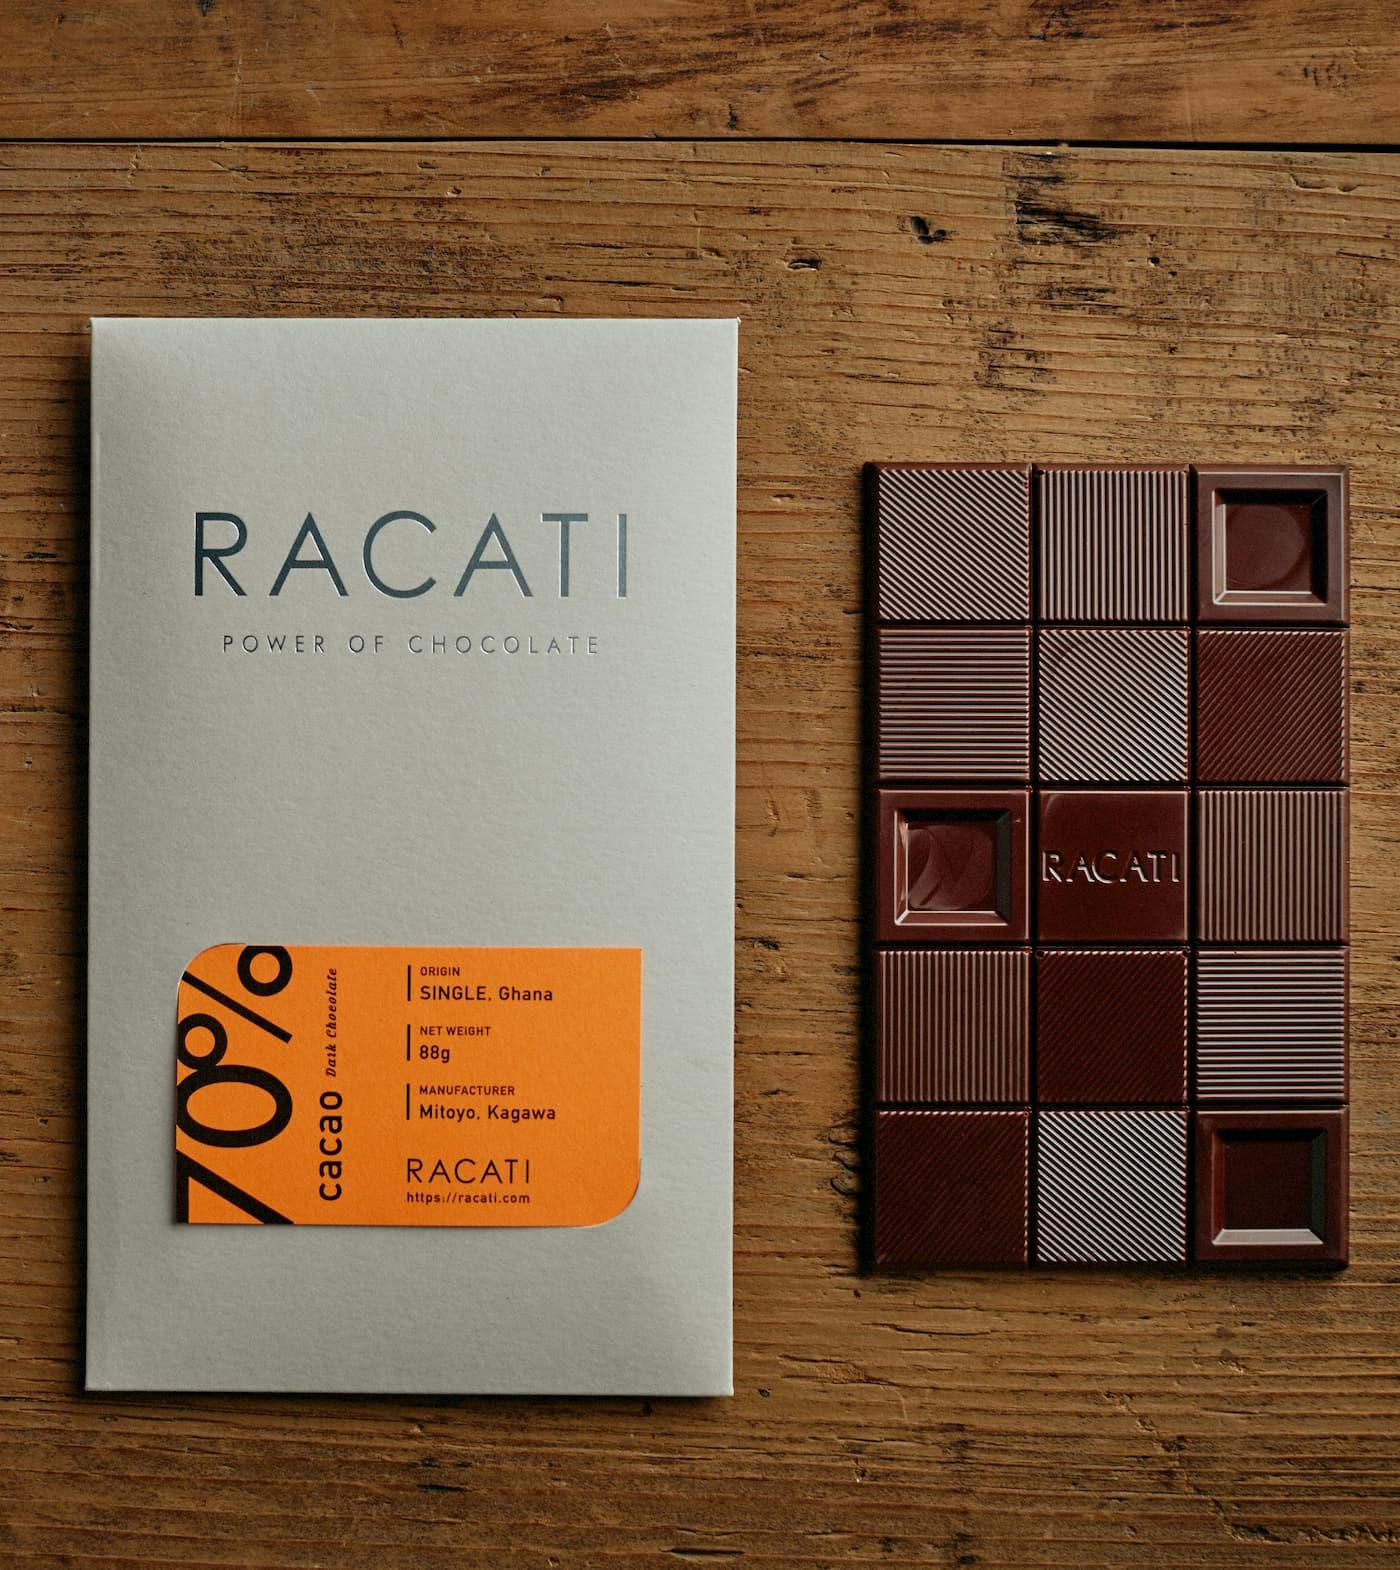 RACATIのチョコレートパッケージ